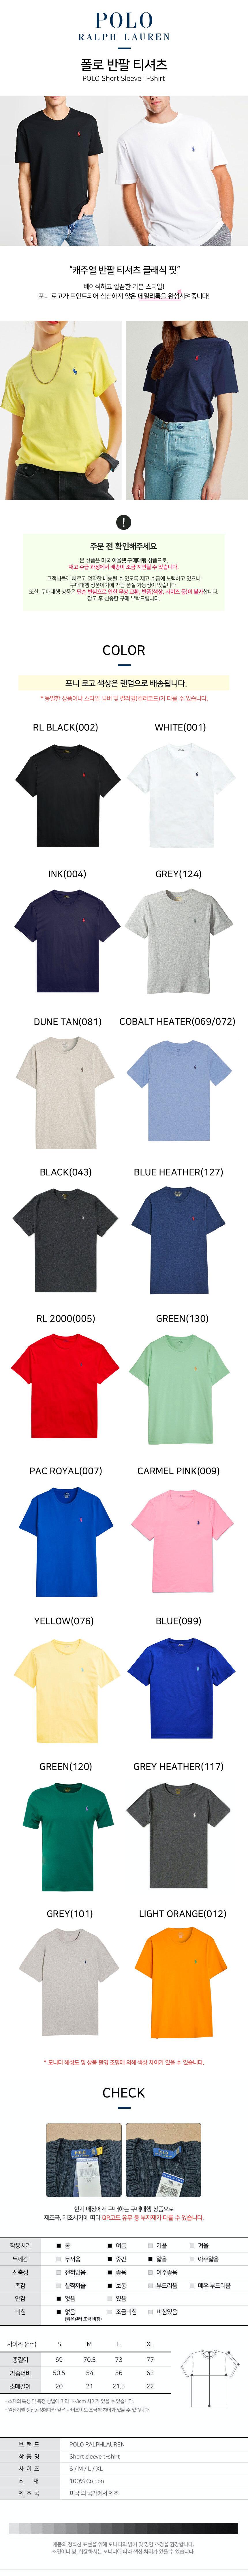 t_shirt.jpg